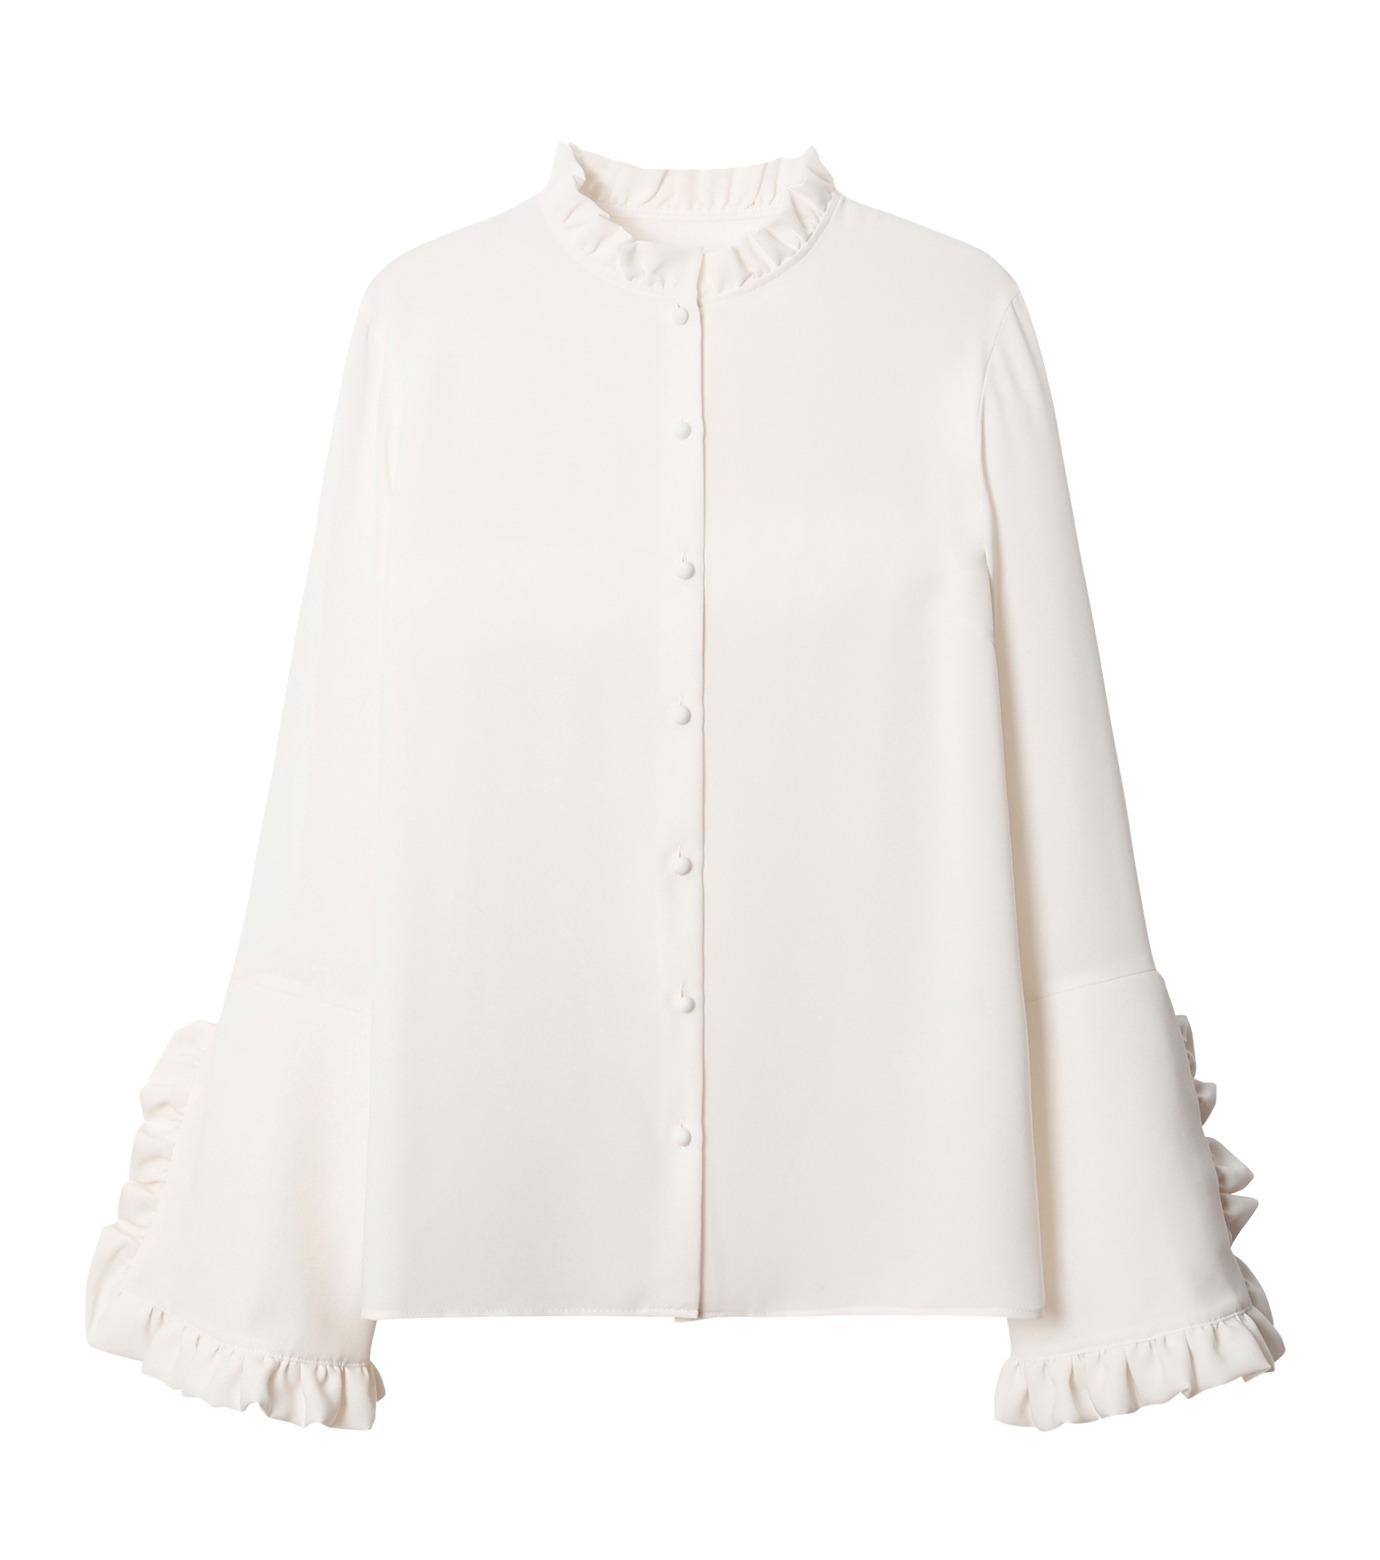 LE CIEL BLEU(ルシェルブルー)のフリルブラウス-WHITE(シャツ/shirt)-18A63416 拡大詳細画像4